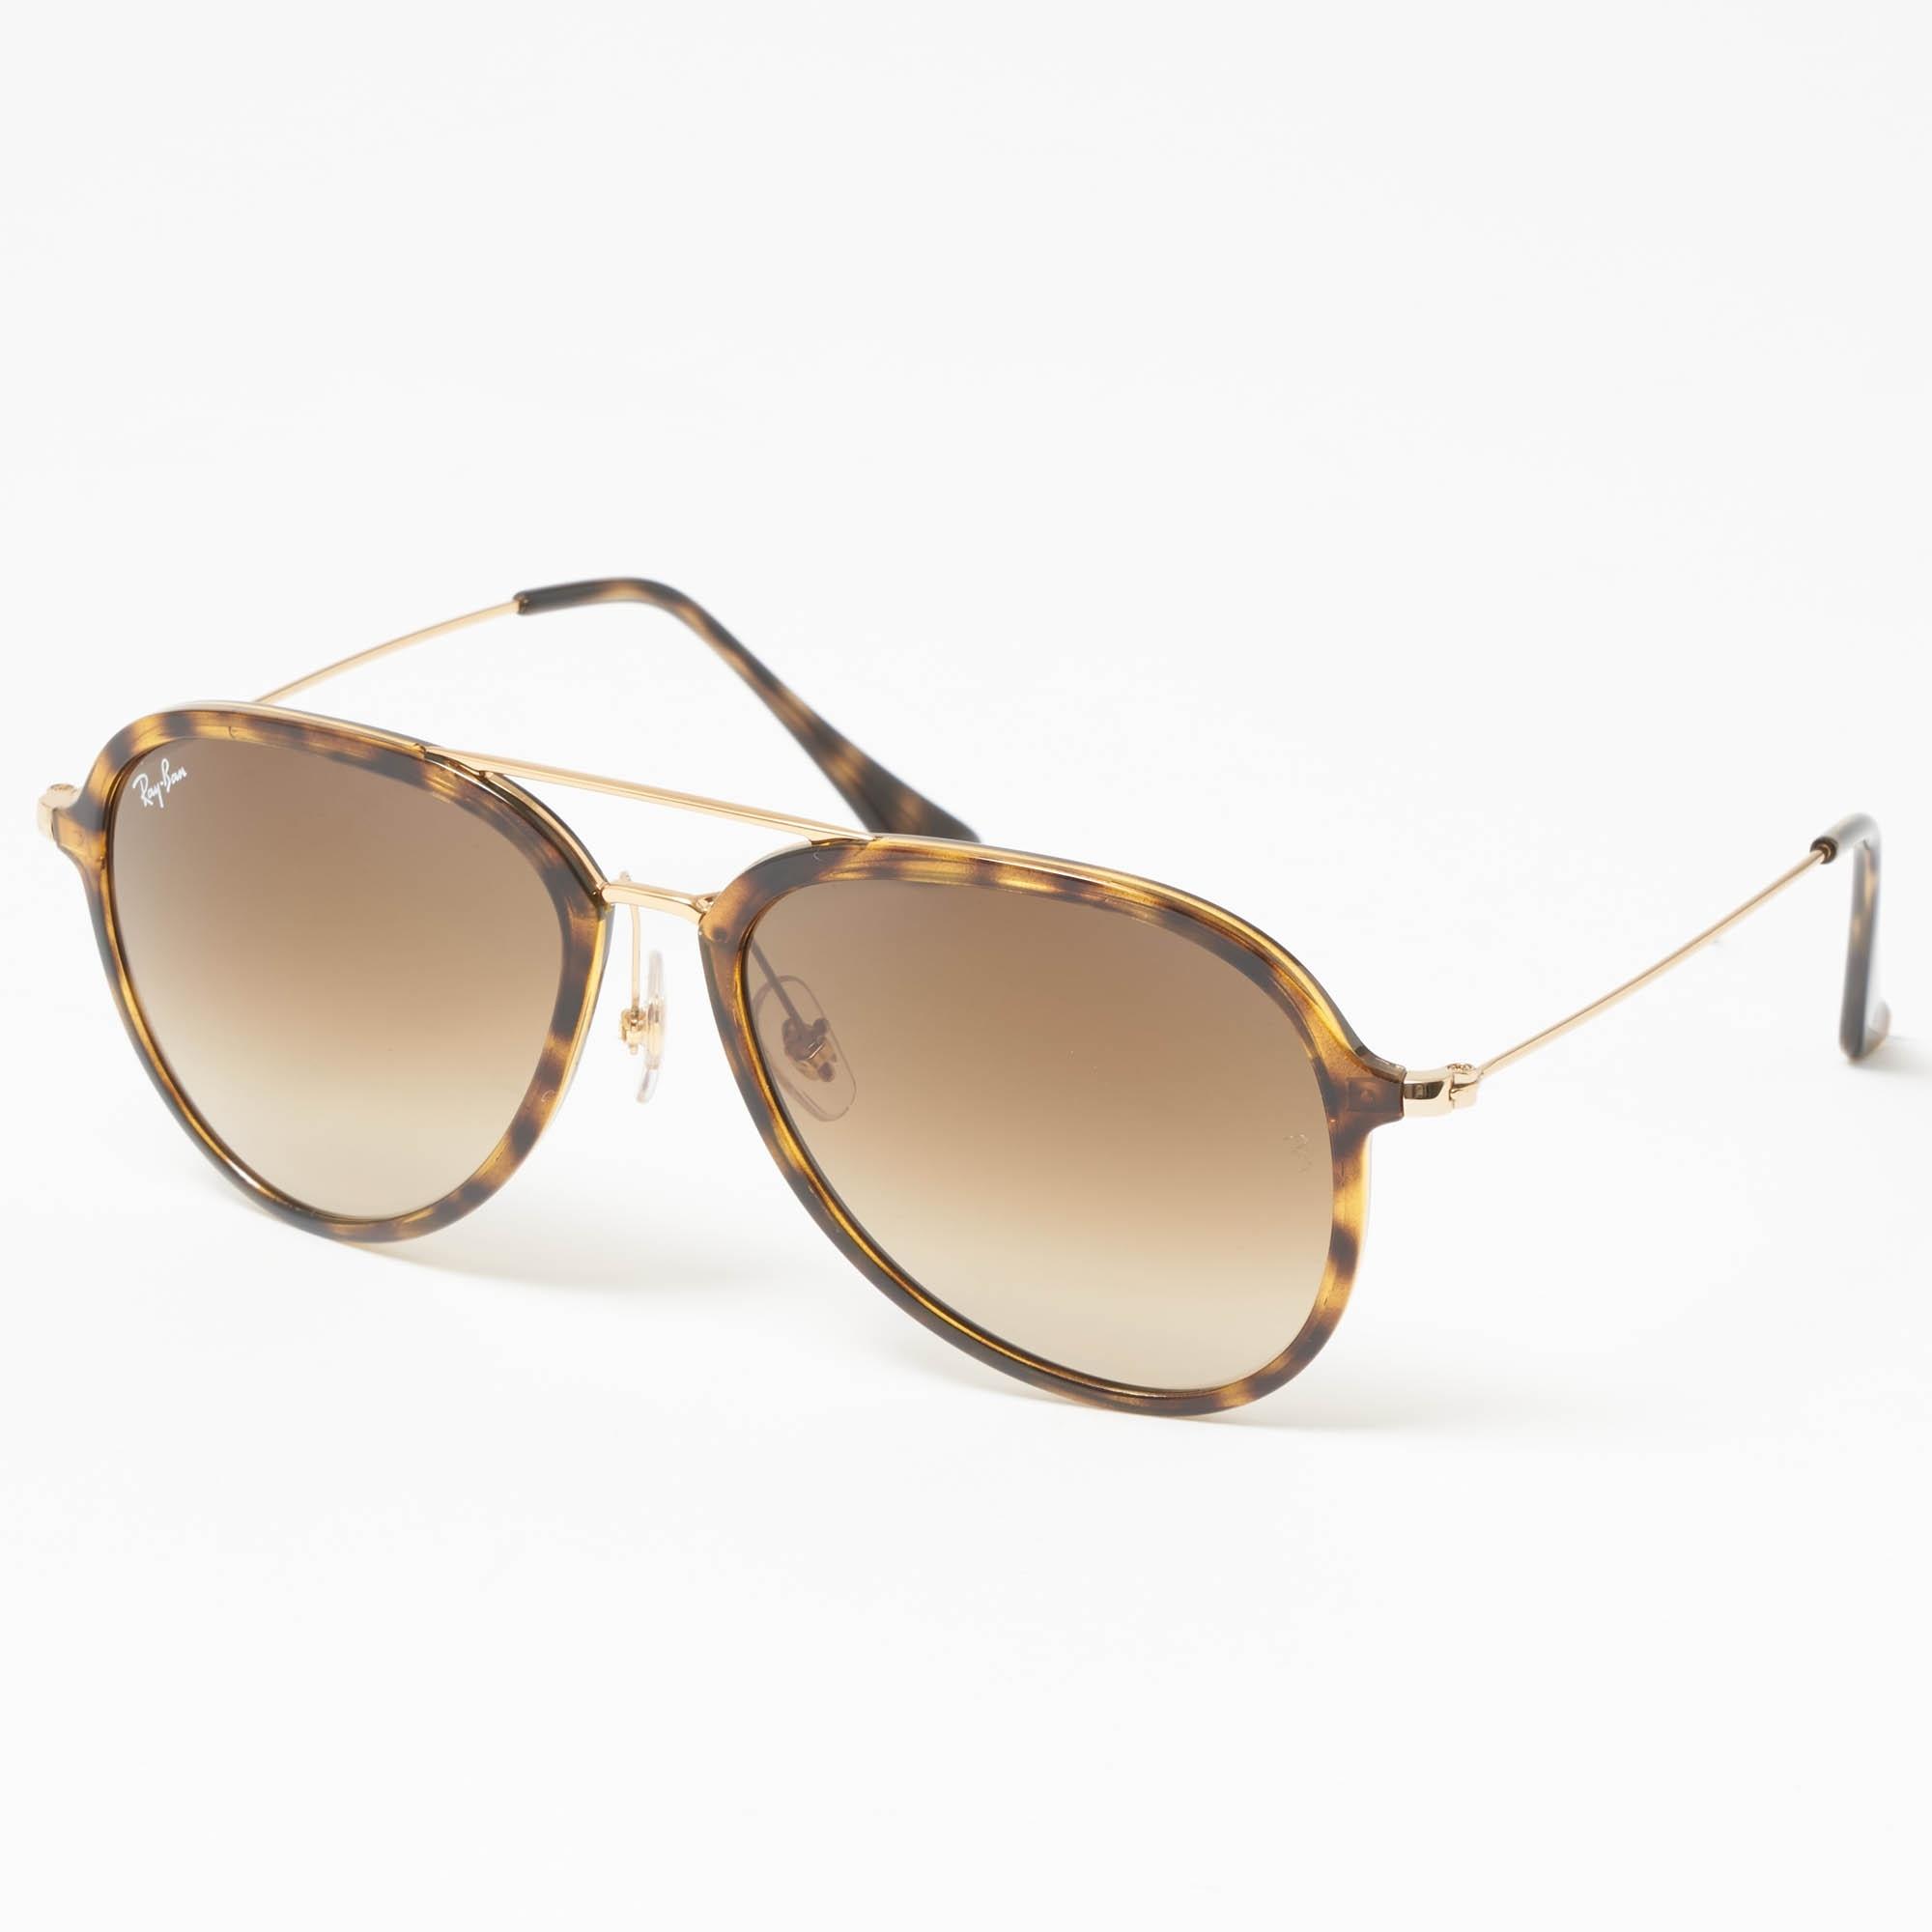 bc946a82543 Tortoise RB4298 Sunglasses - Light Brown Gradient Lenses